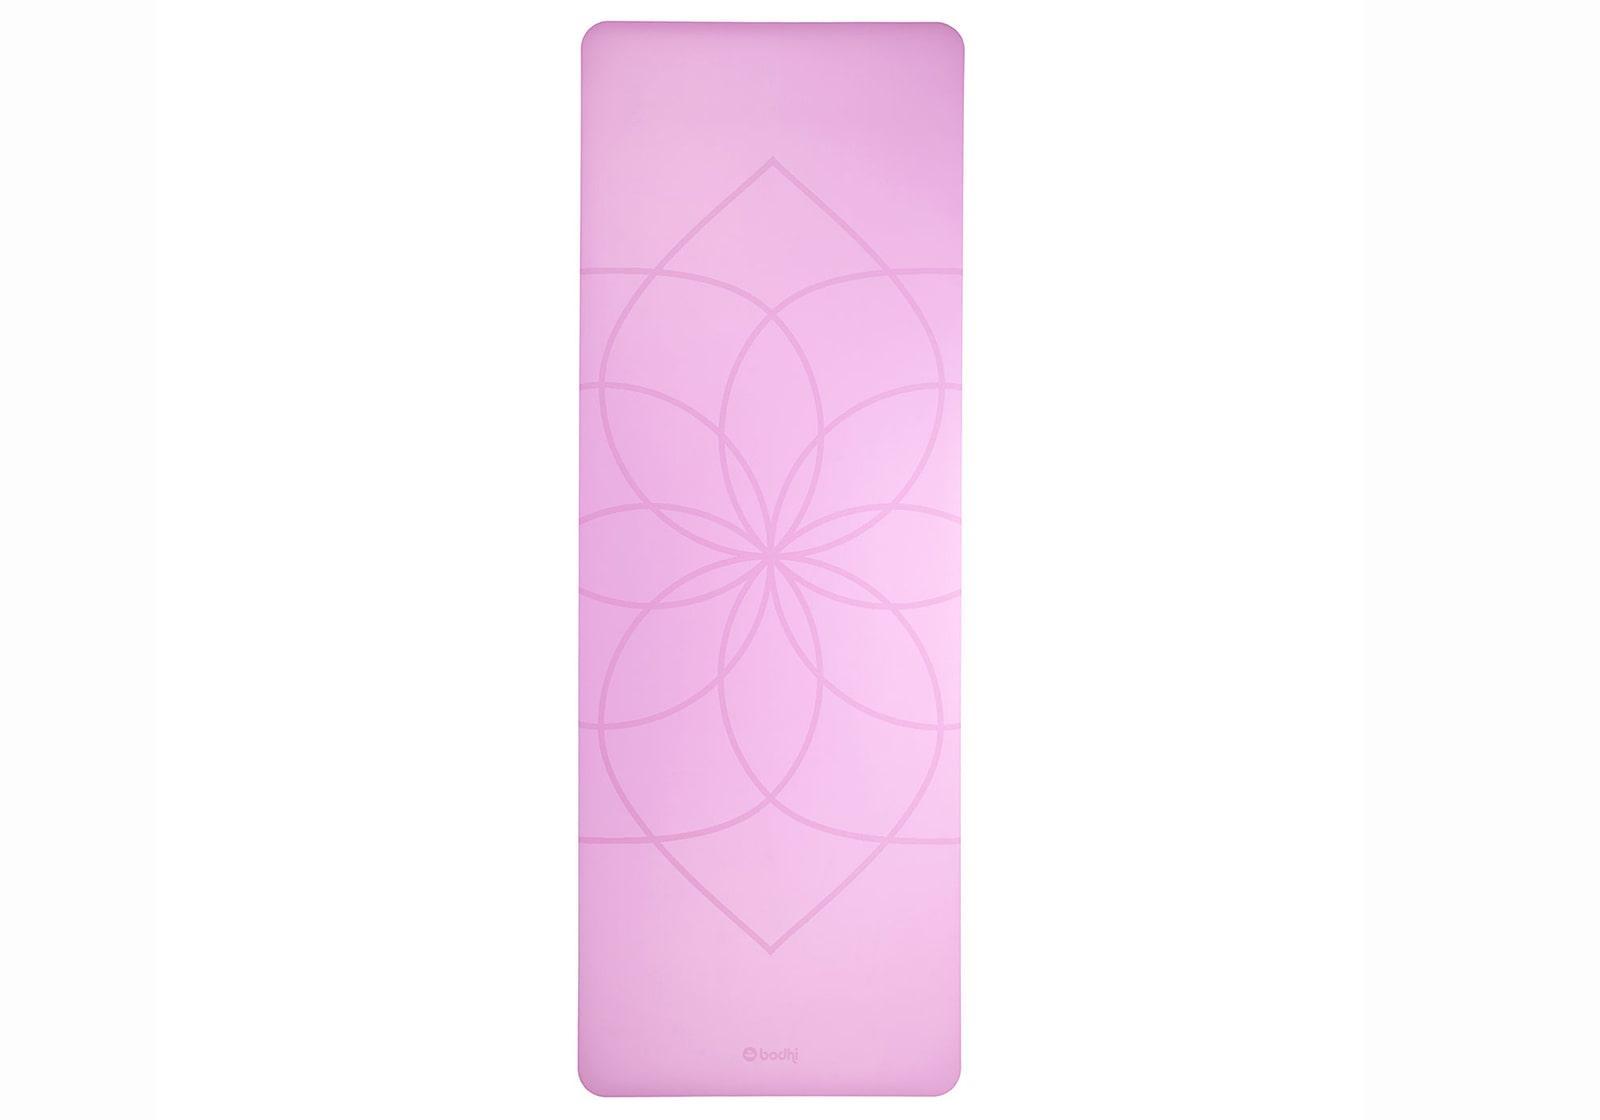 yogamatte_bodhi_phoenix_lila1-min.jpg